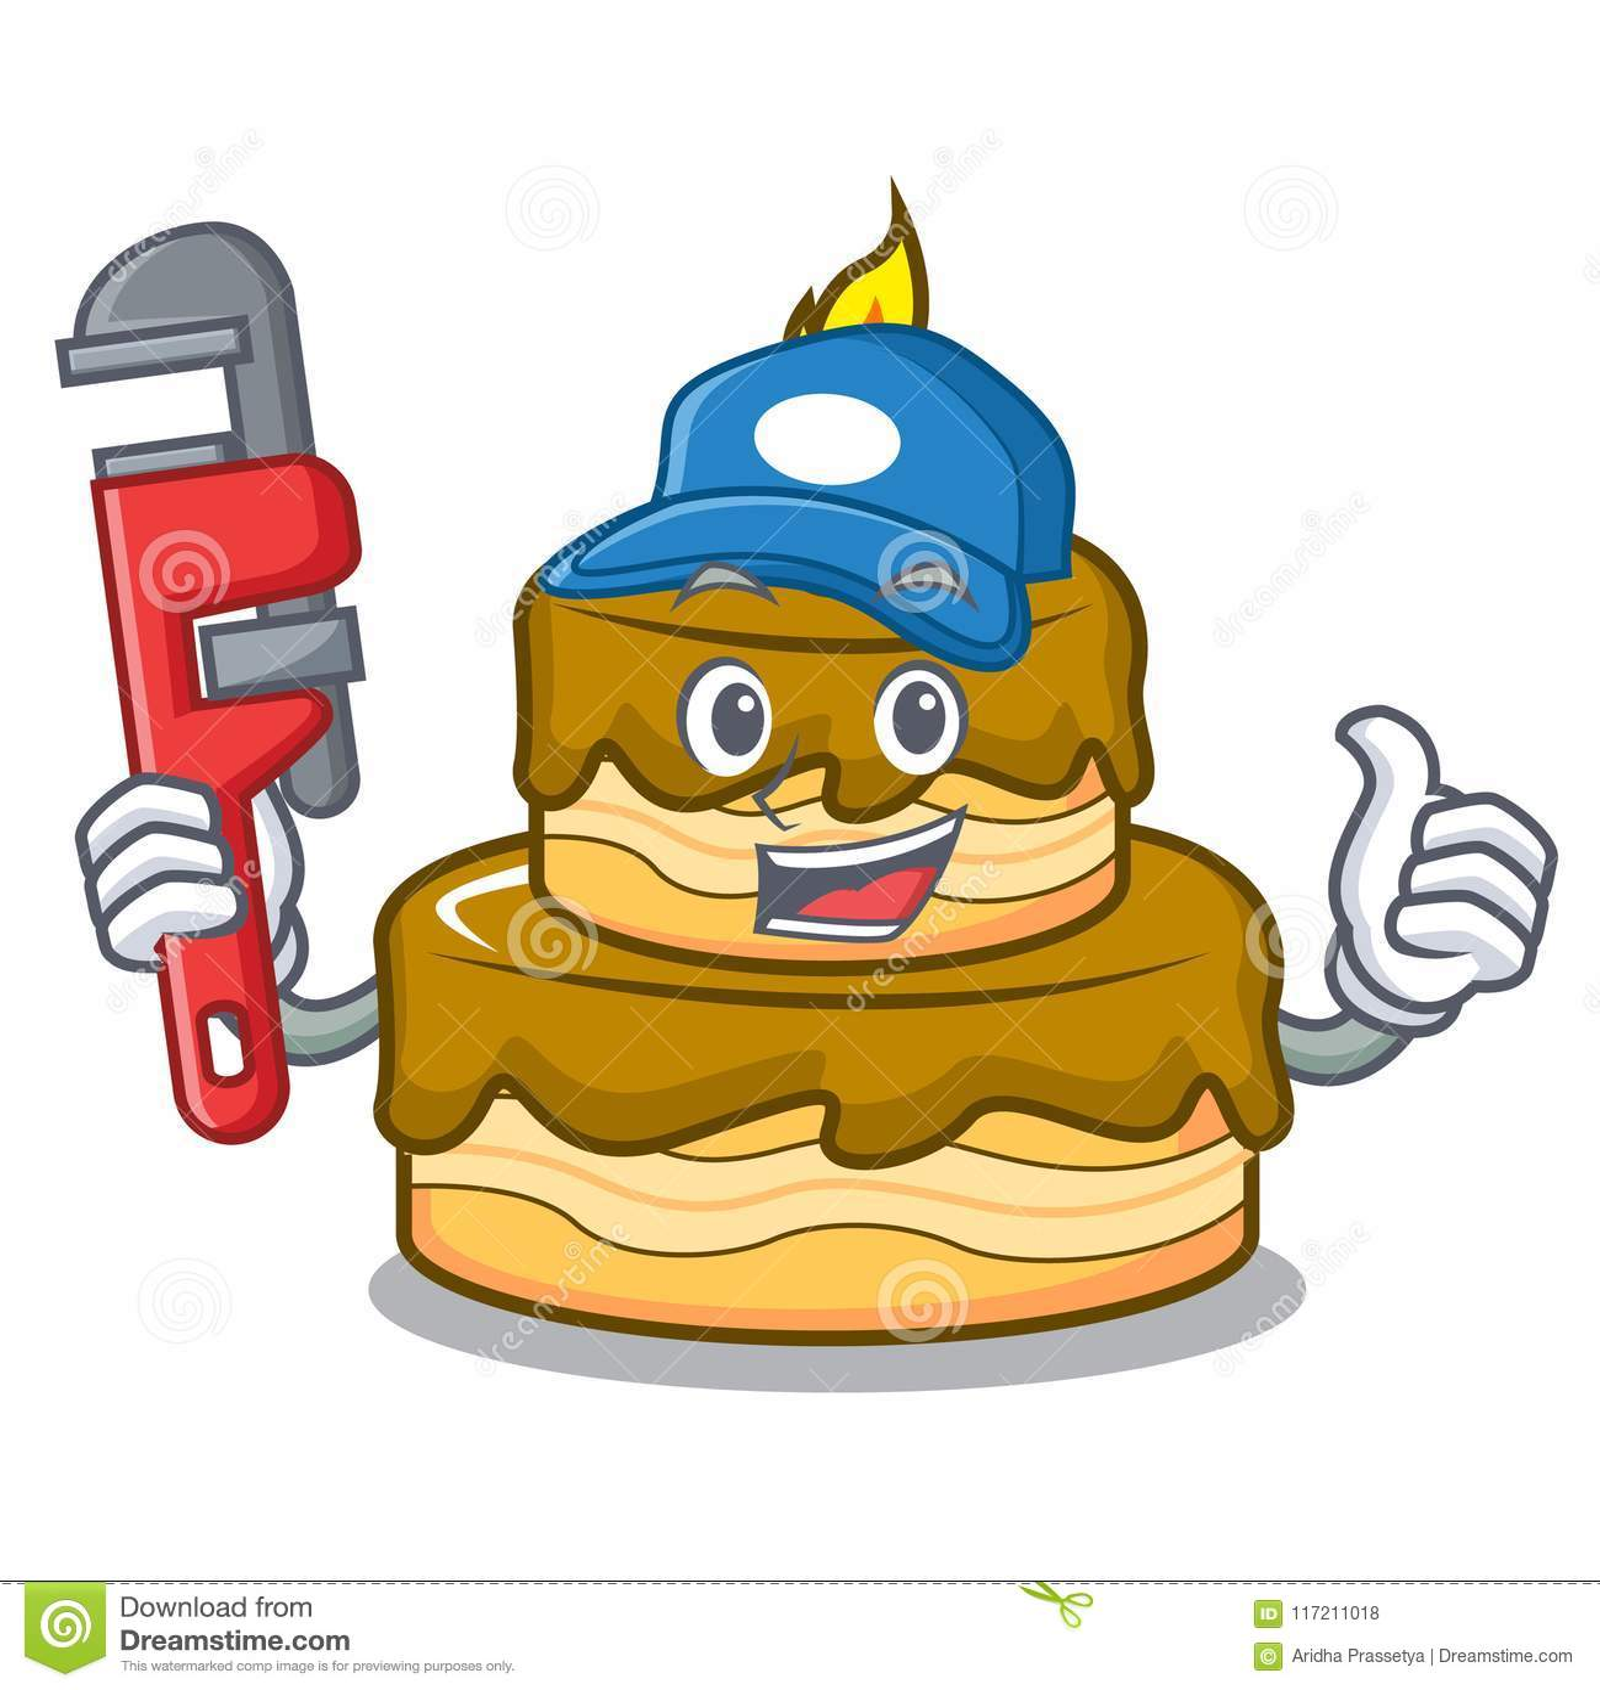 Groovy Plumber Birthday Cake Mascot Cartoon Stock Vector Illustration Funny Birthday Cards Online Amentibdeldamsfinfo